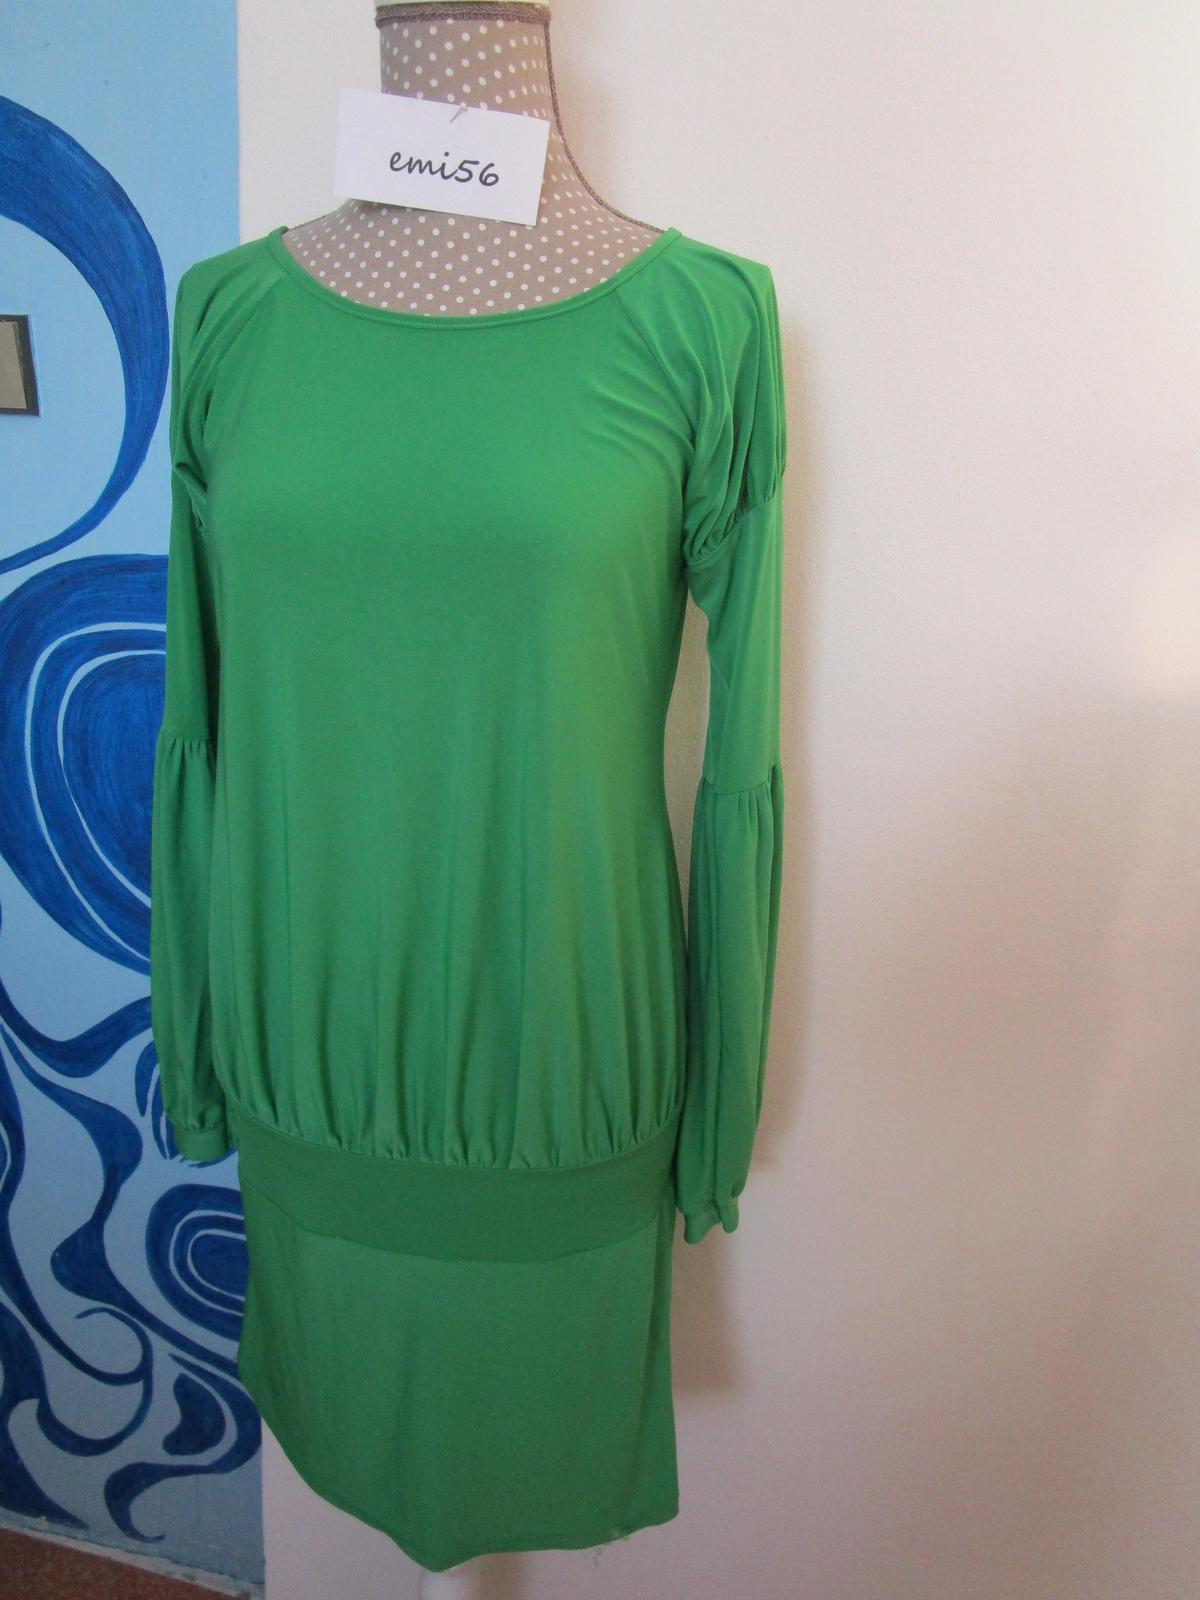 2105. šaty - Obrázok č. 1